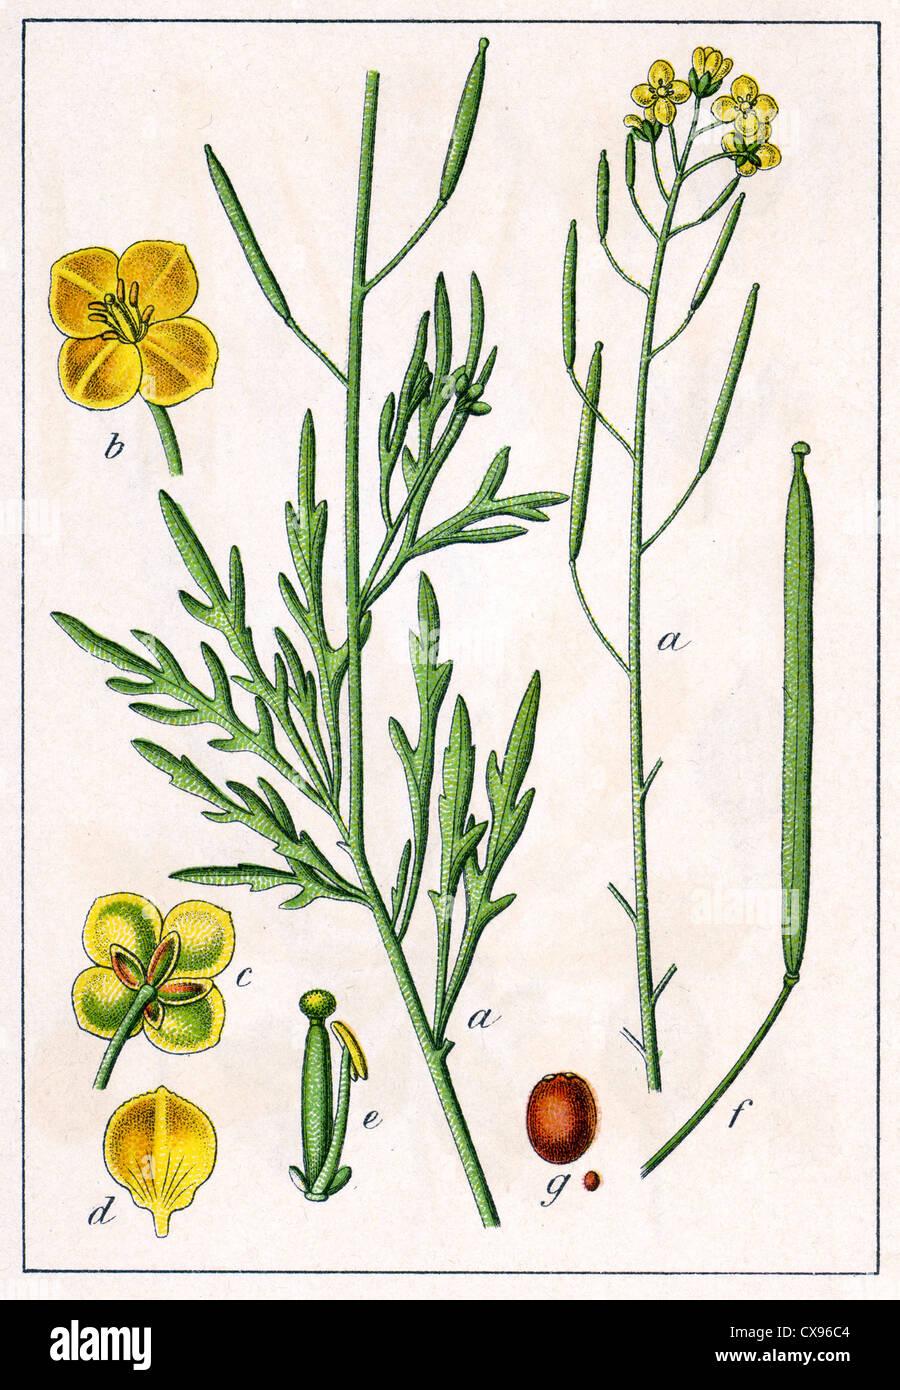 Crucifera tenuifolia - Stock Image